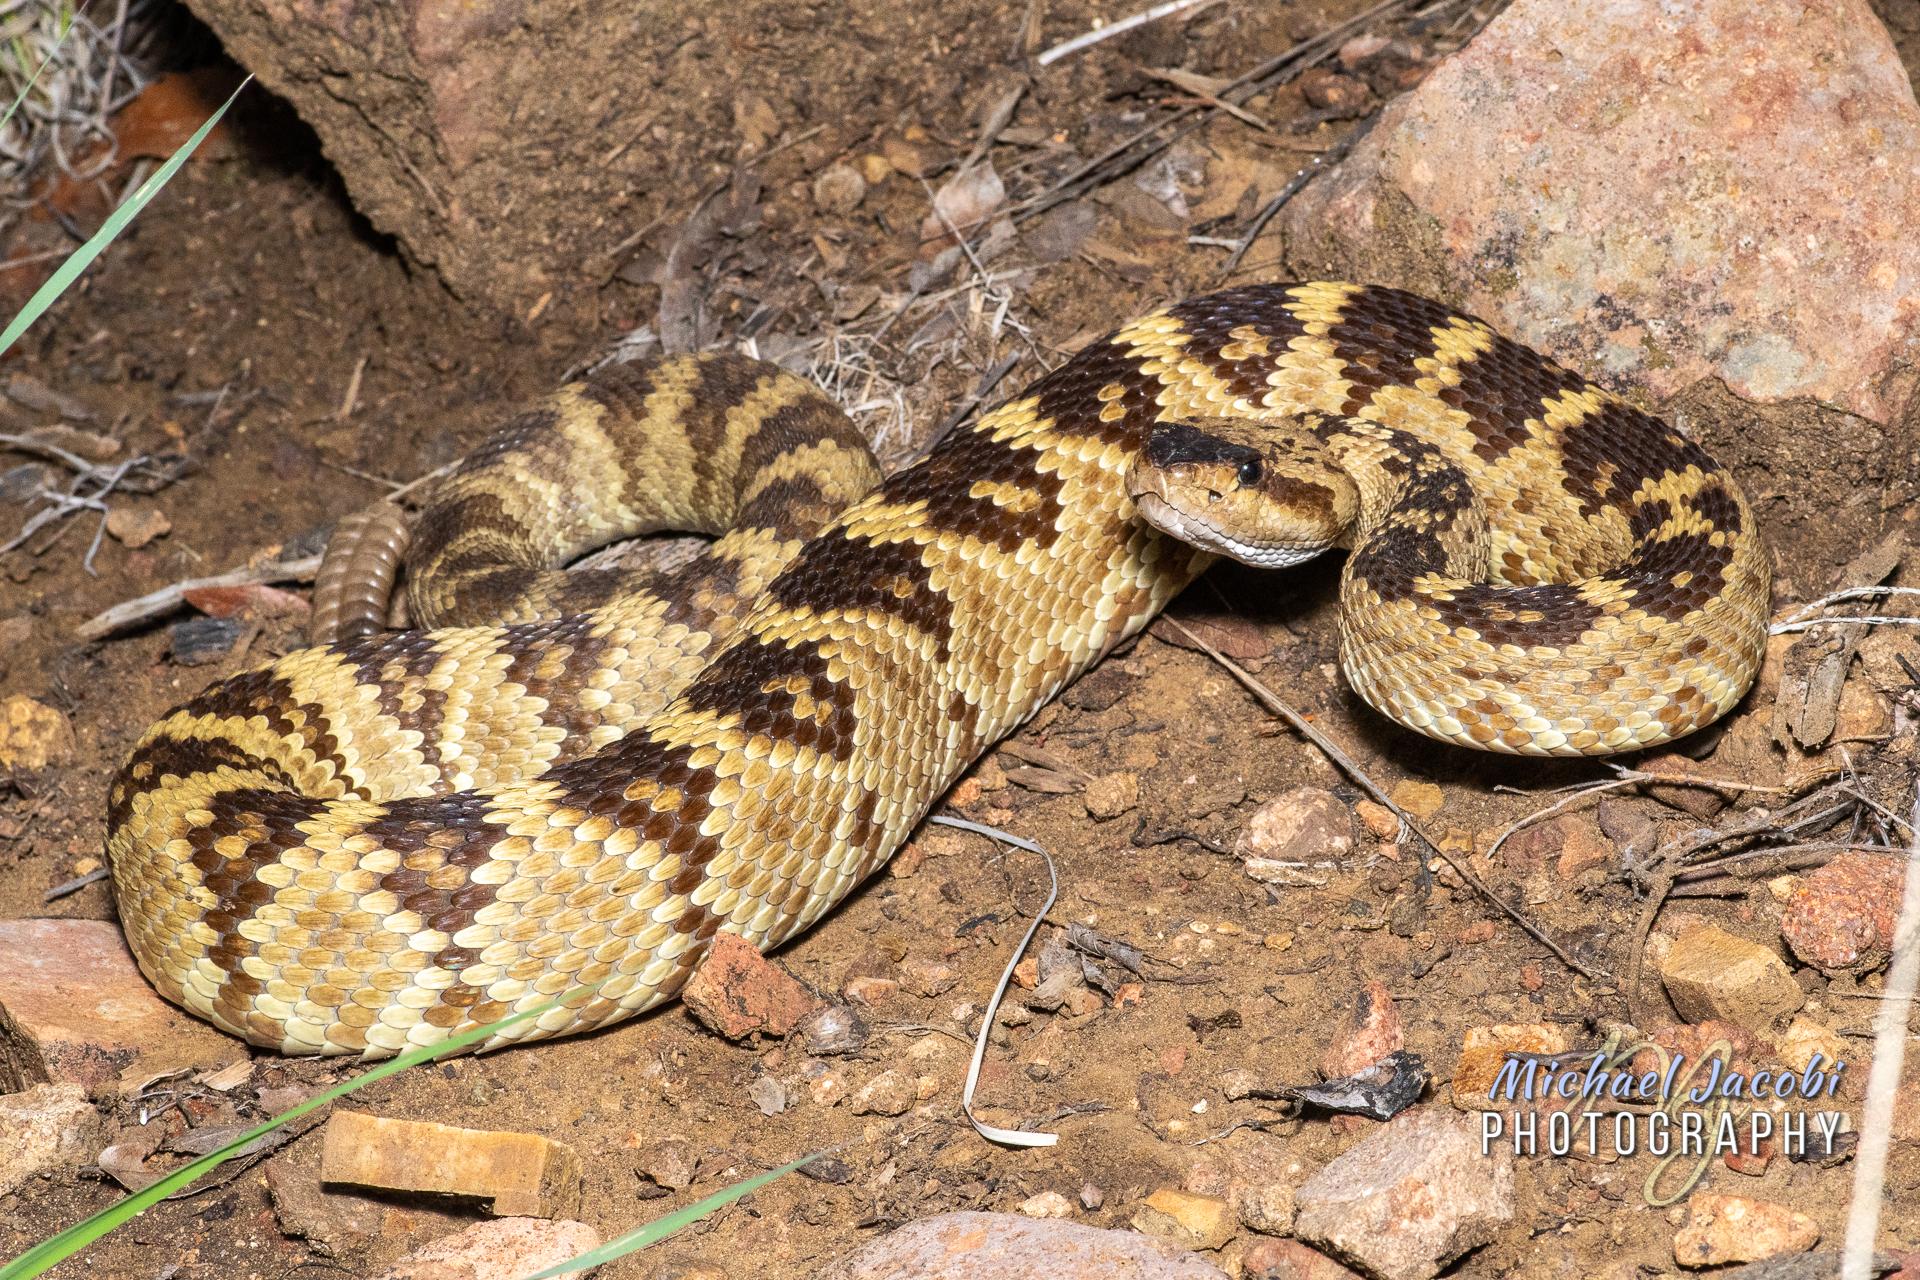 Crotalus molossus 'molossus' , Western (or Northern) Black-tailed Rattlesnake, Chiricahua Mountains, AZ